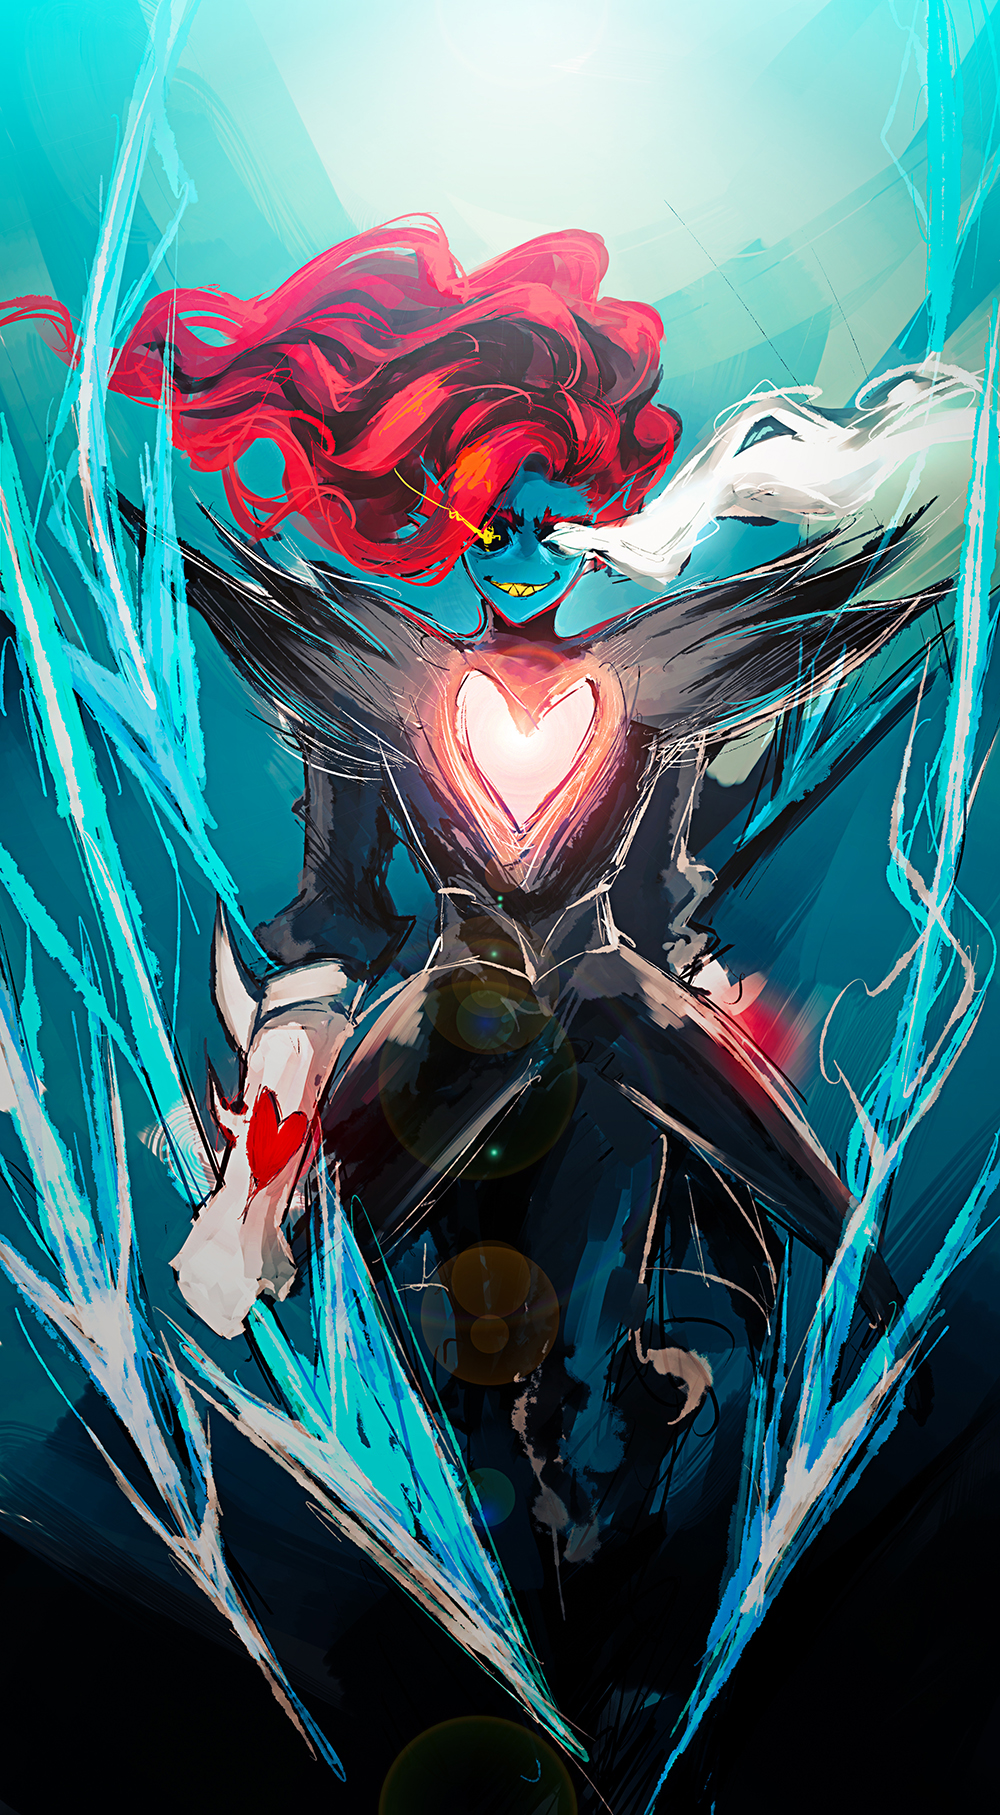 Undyne the Undying Image #2650798 - Zerochan Anime Image Board